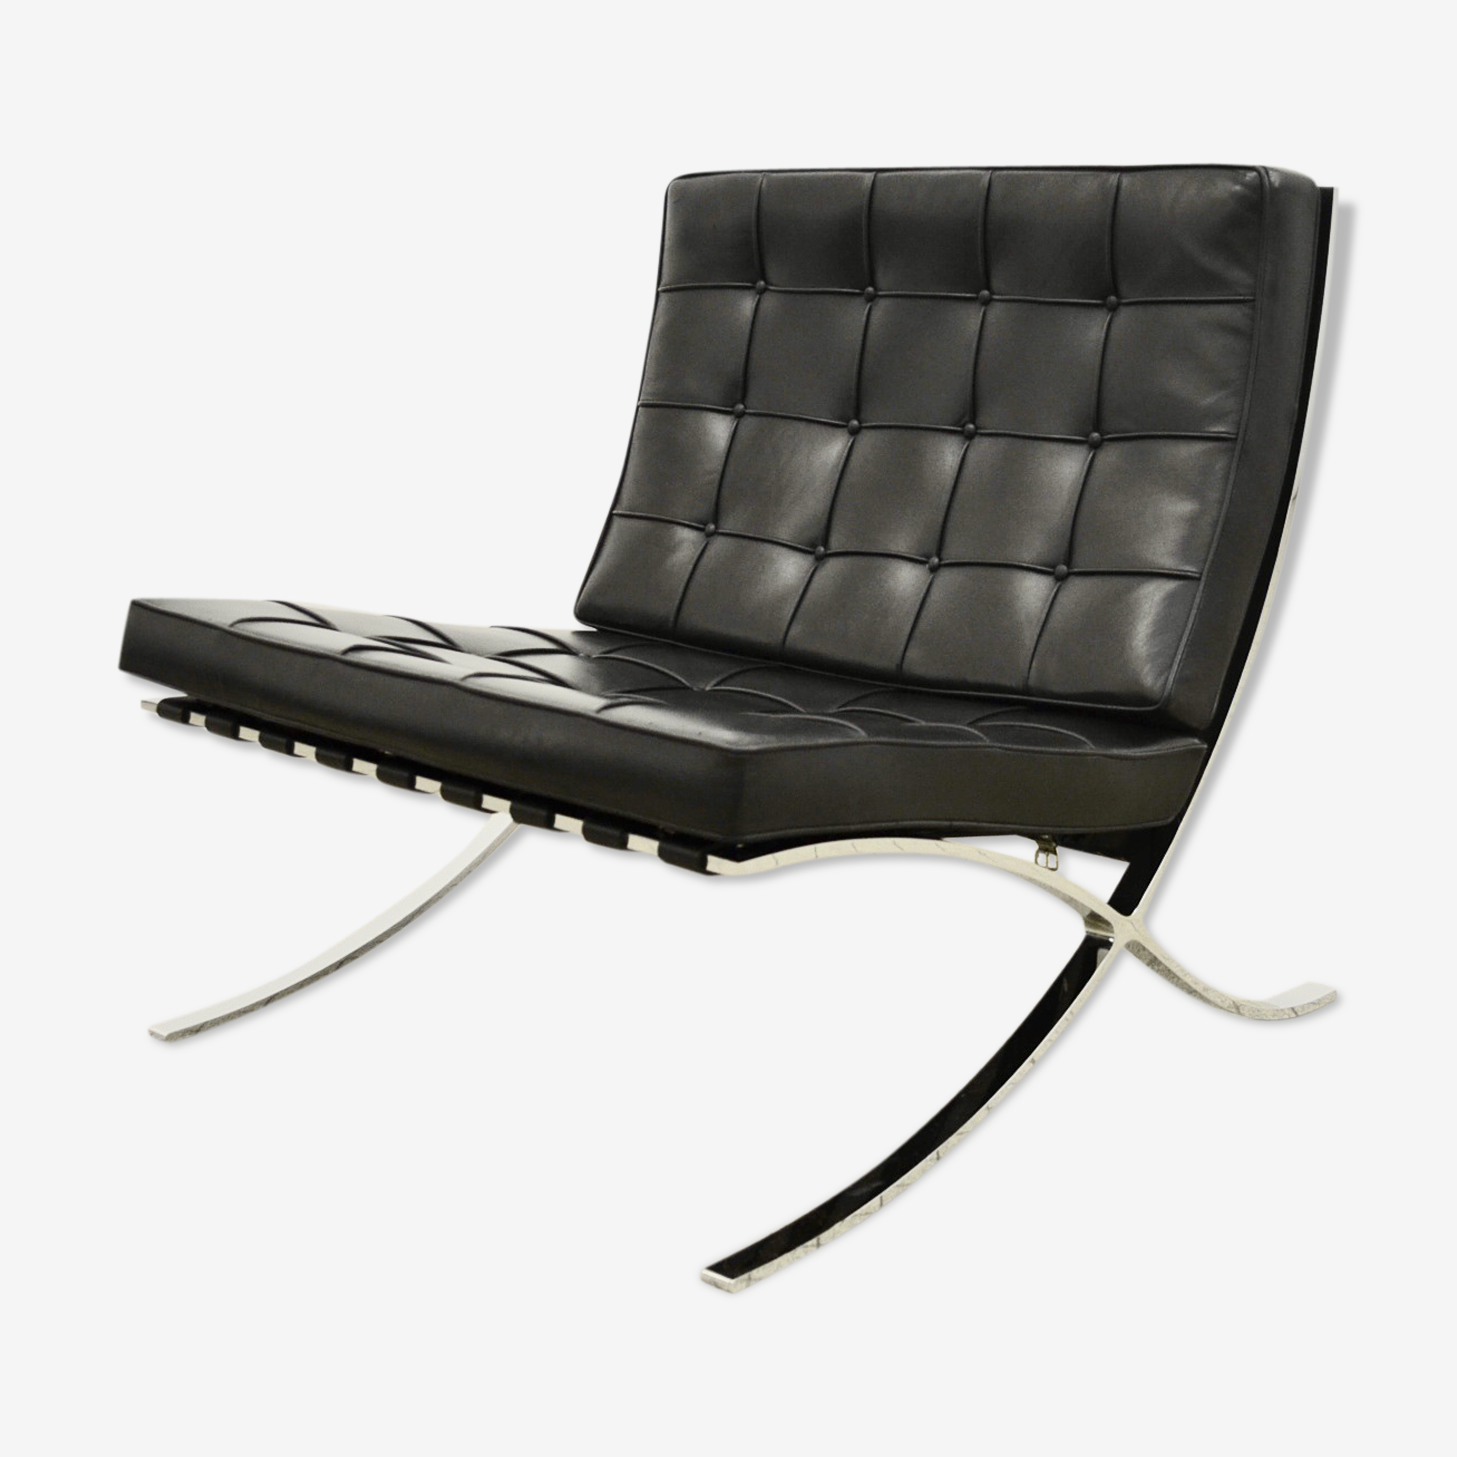 Barcelona Knoll armchair by Mies Van Der Rohe